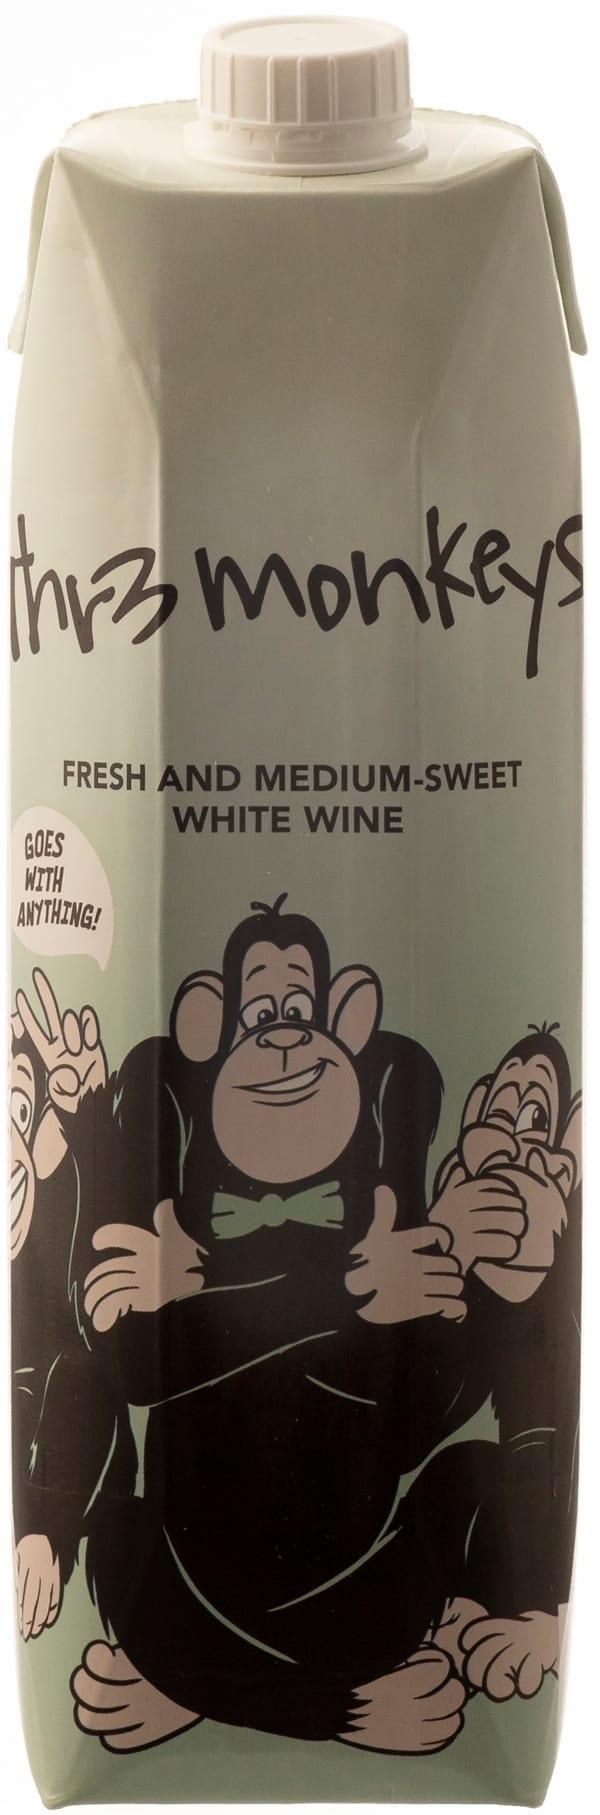 Thr3 Monkeys 2018 carton package